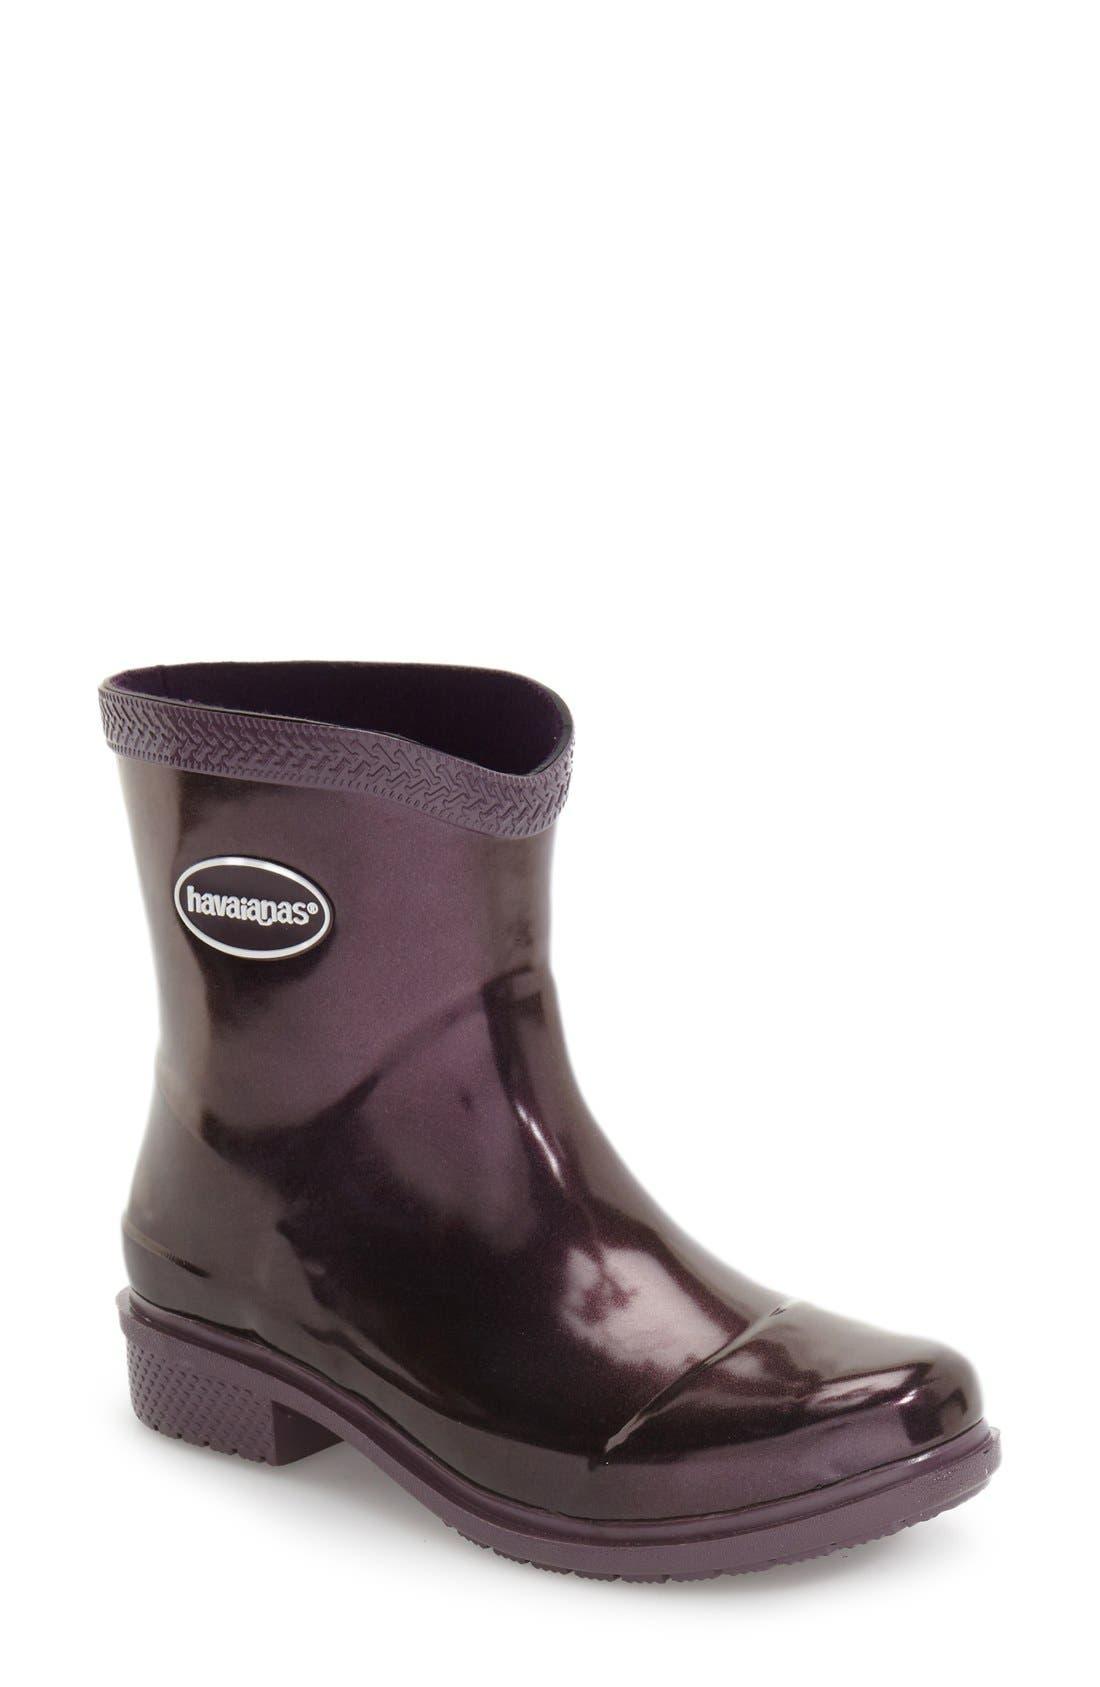 HAVAIANAS Galochas Low Metallic Waterproof Rain Boot